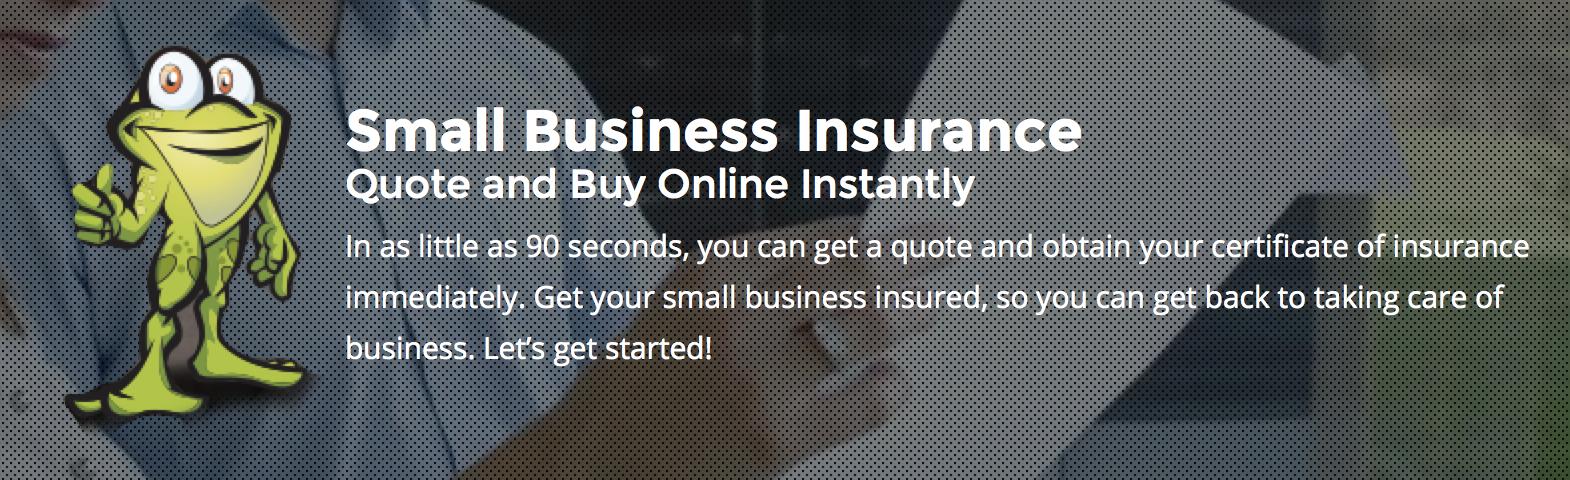 Liability Insurance Small Business Insurance Bullfrog Small